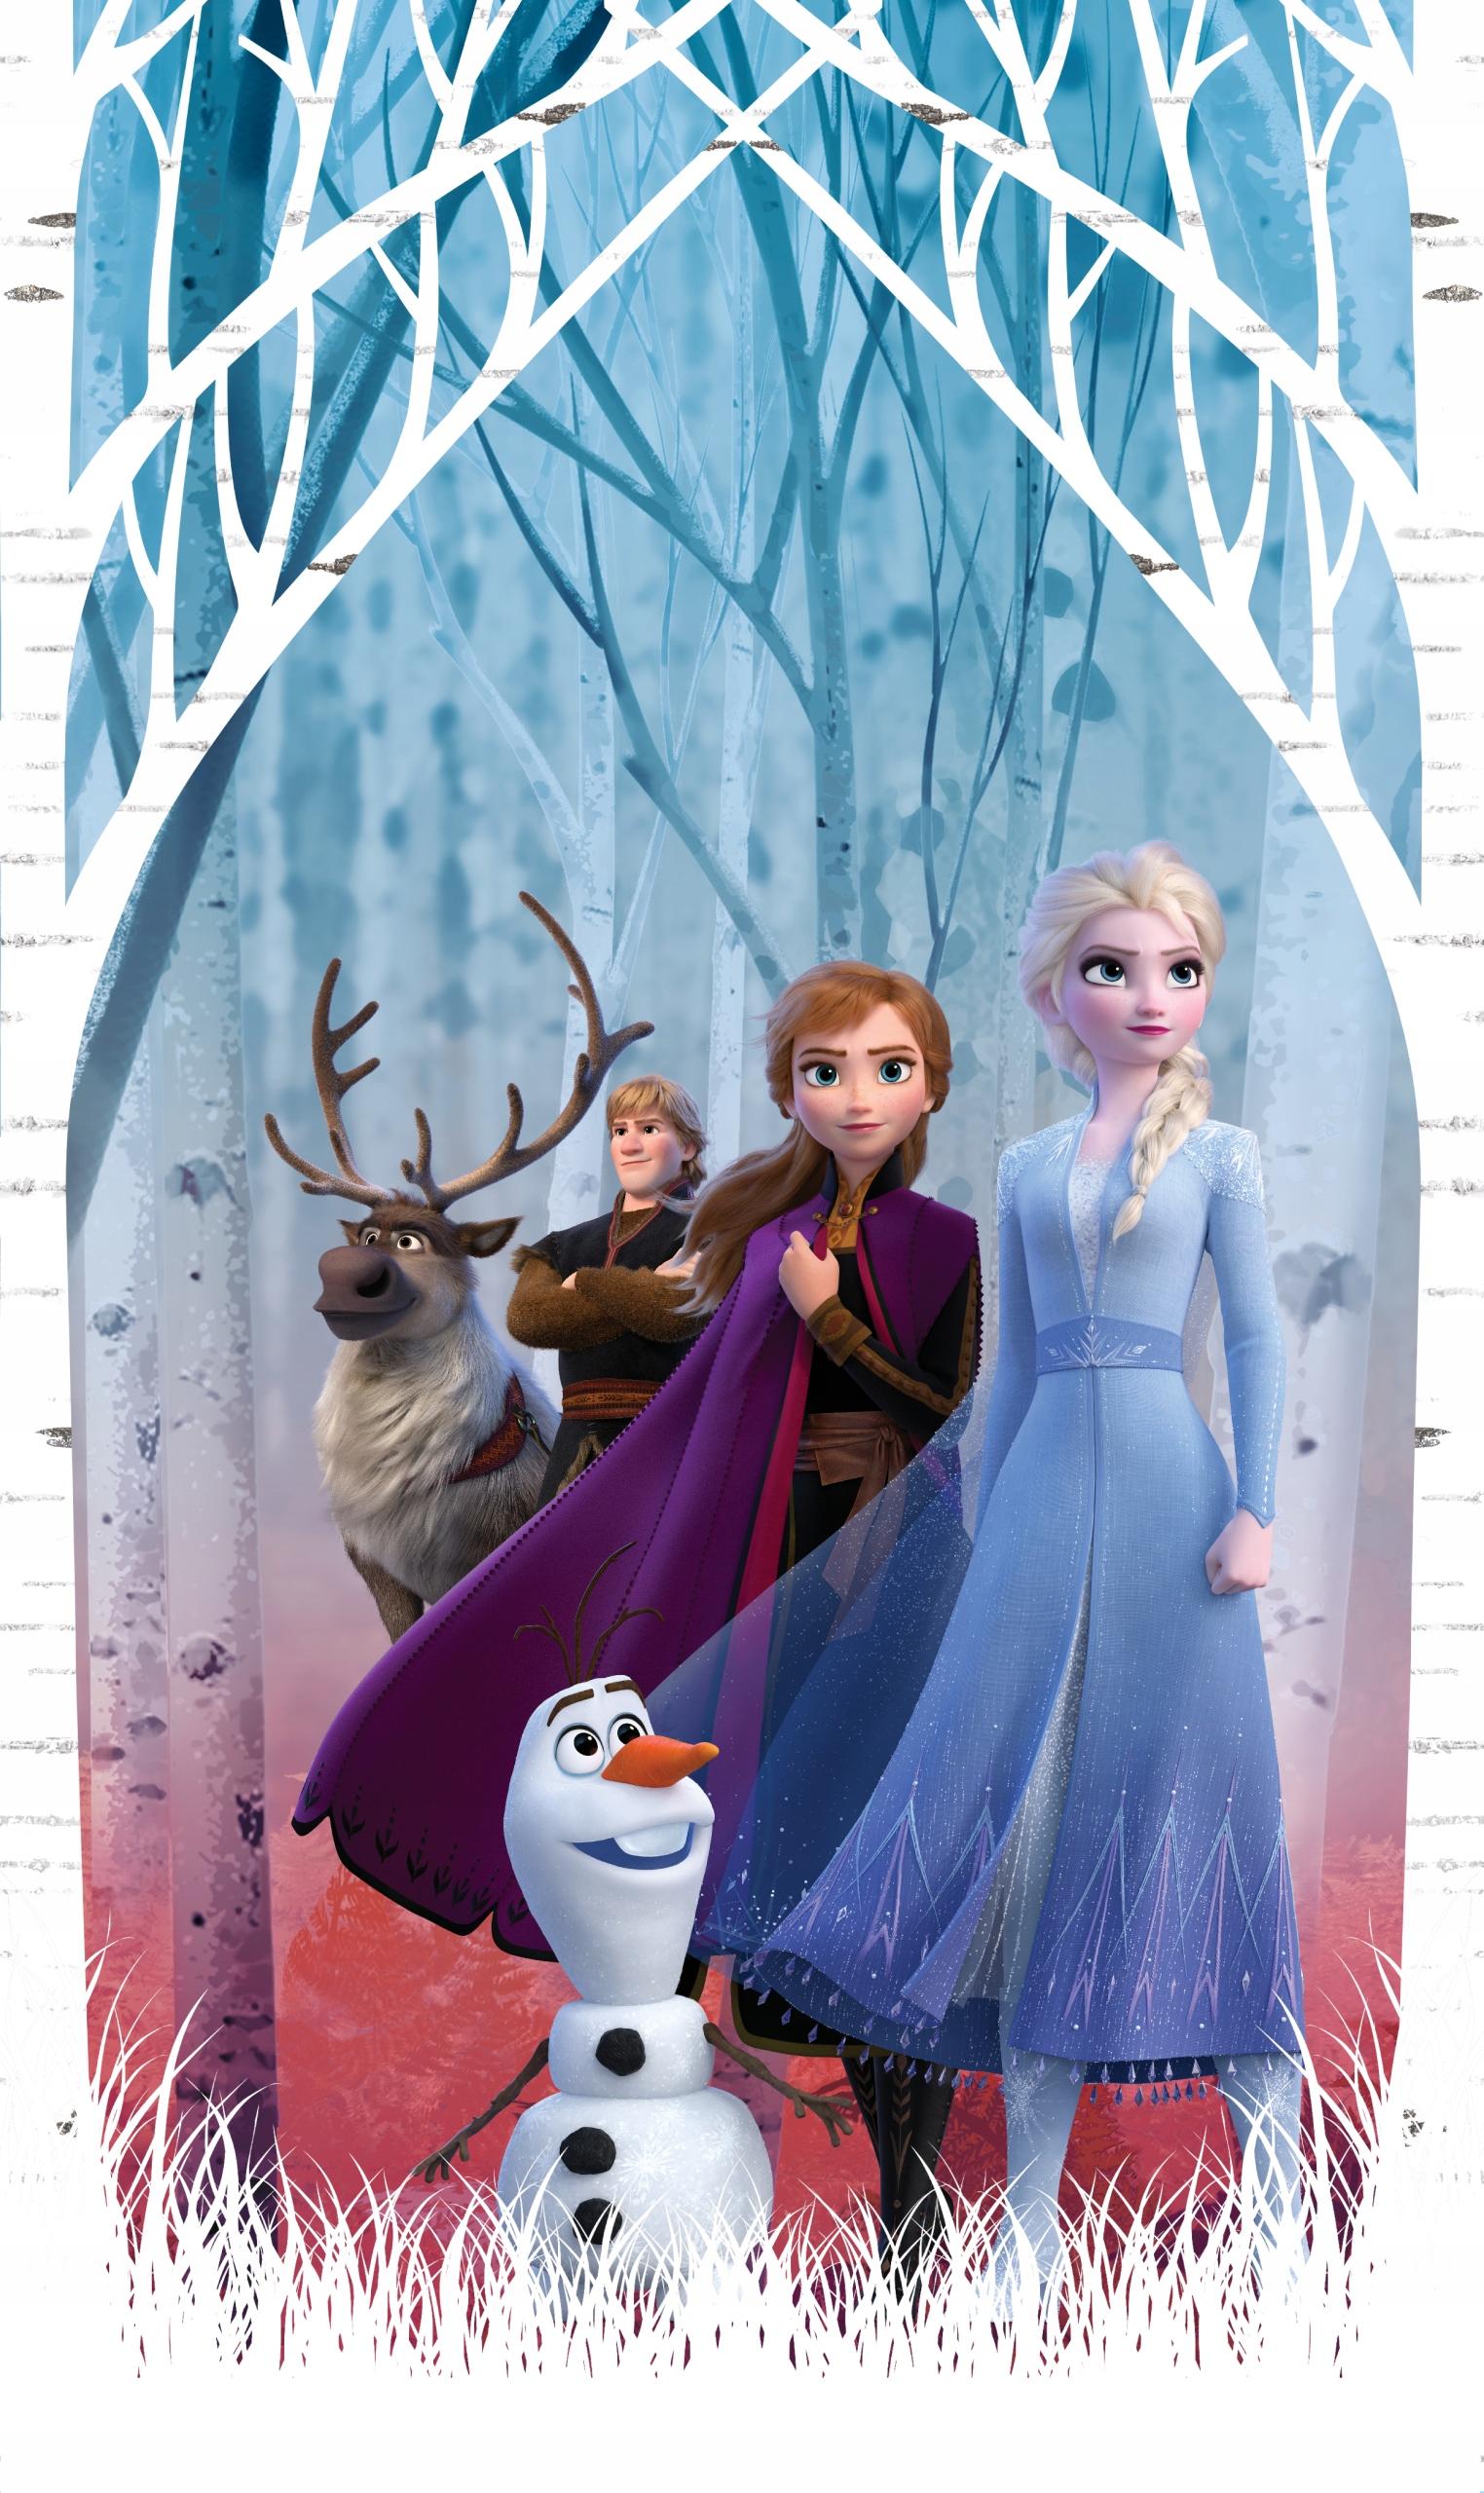 Záves Disney Frozen 2 - 140 x 245 - AG dizajn